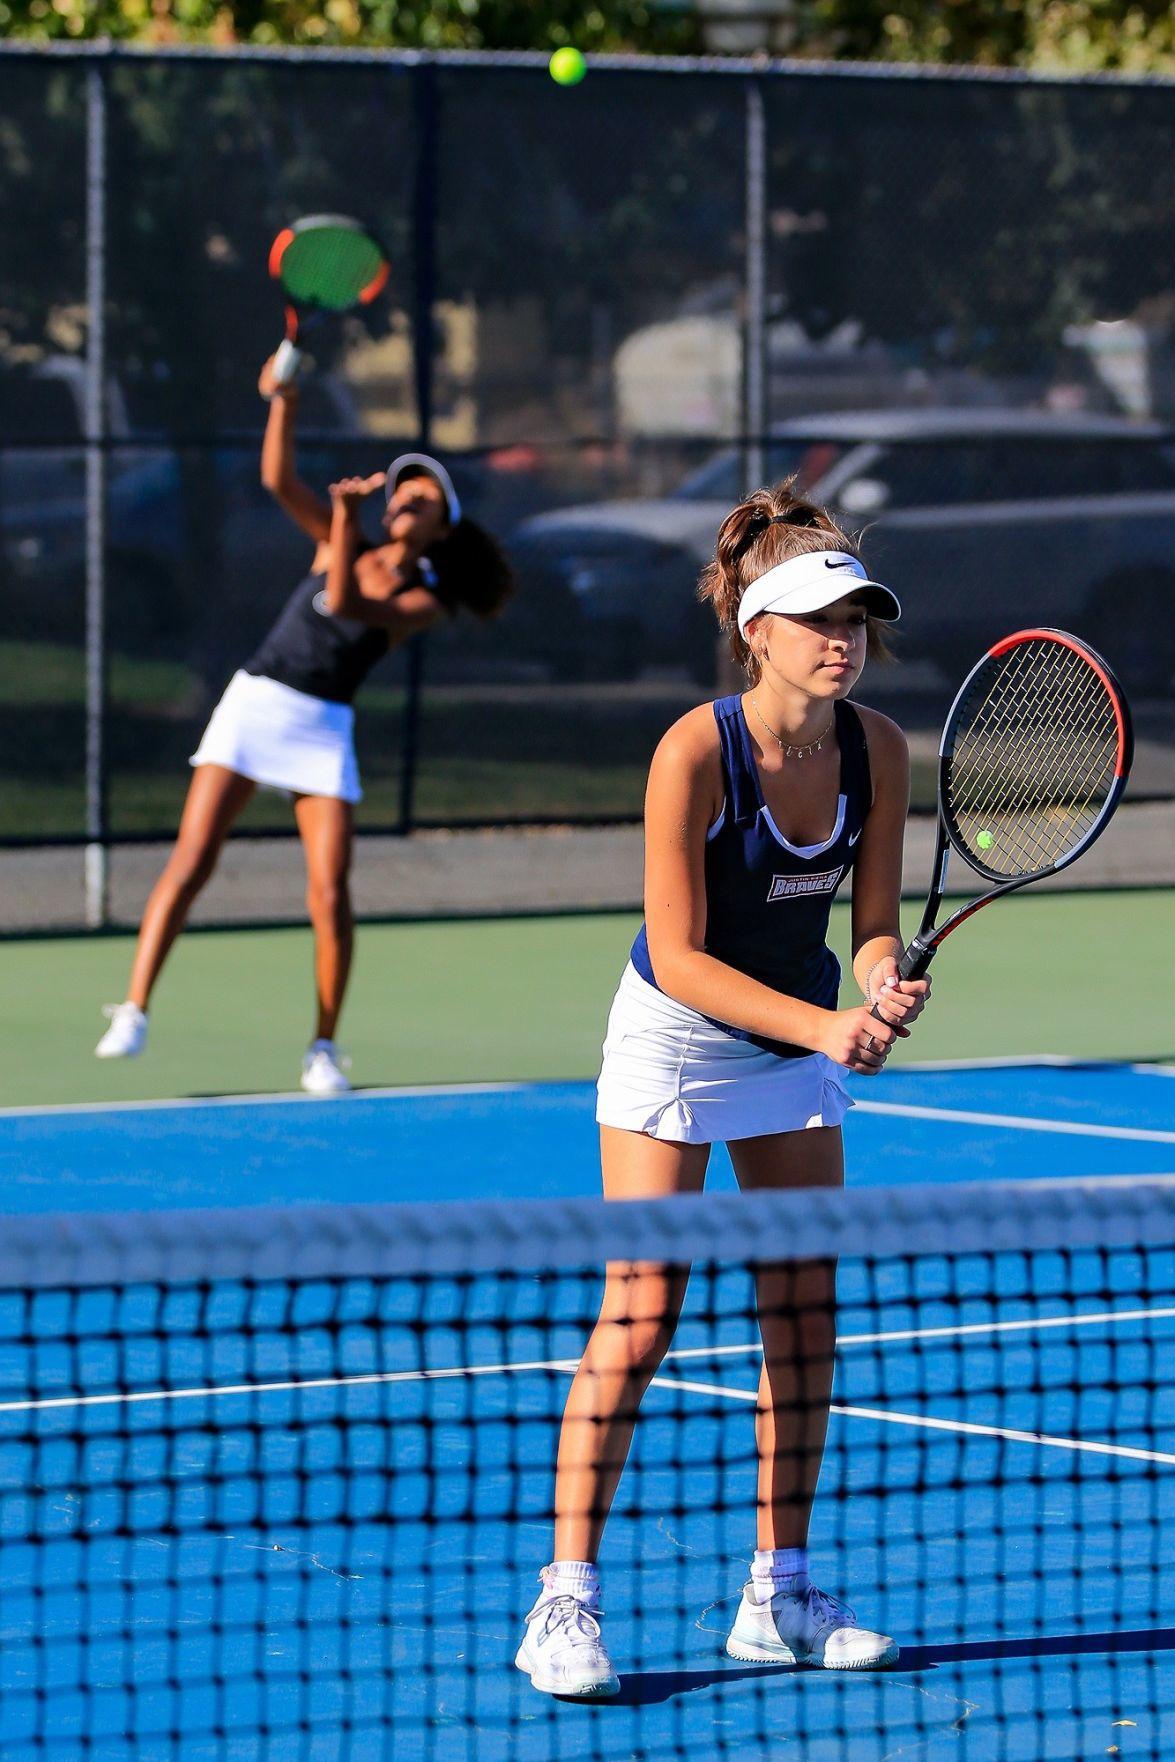 Justin-Siena vs. American Canyon Varsity Girls Tennis